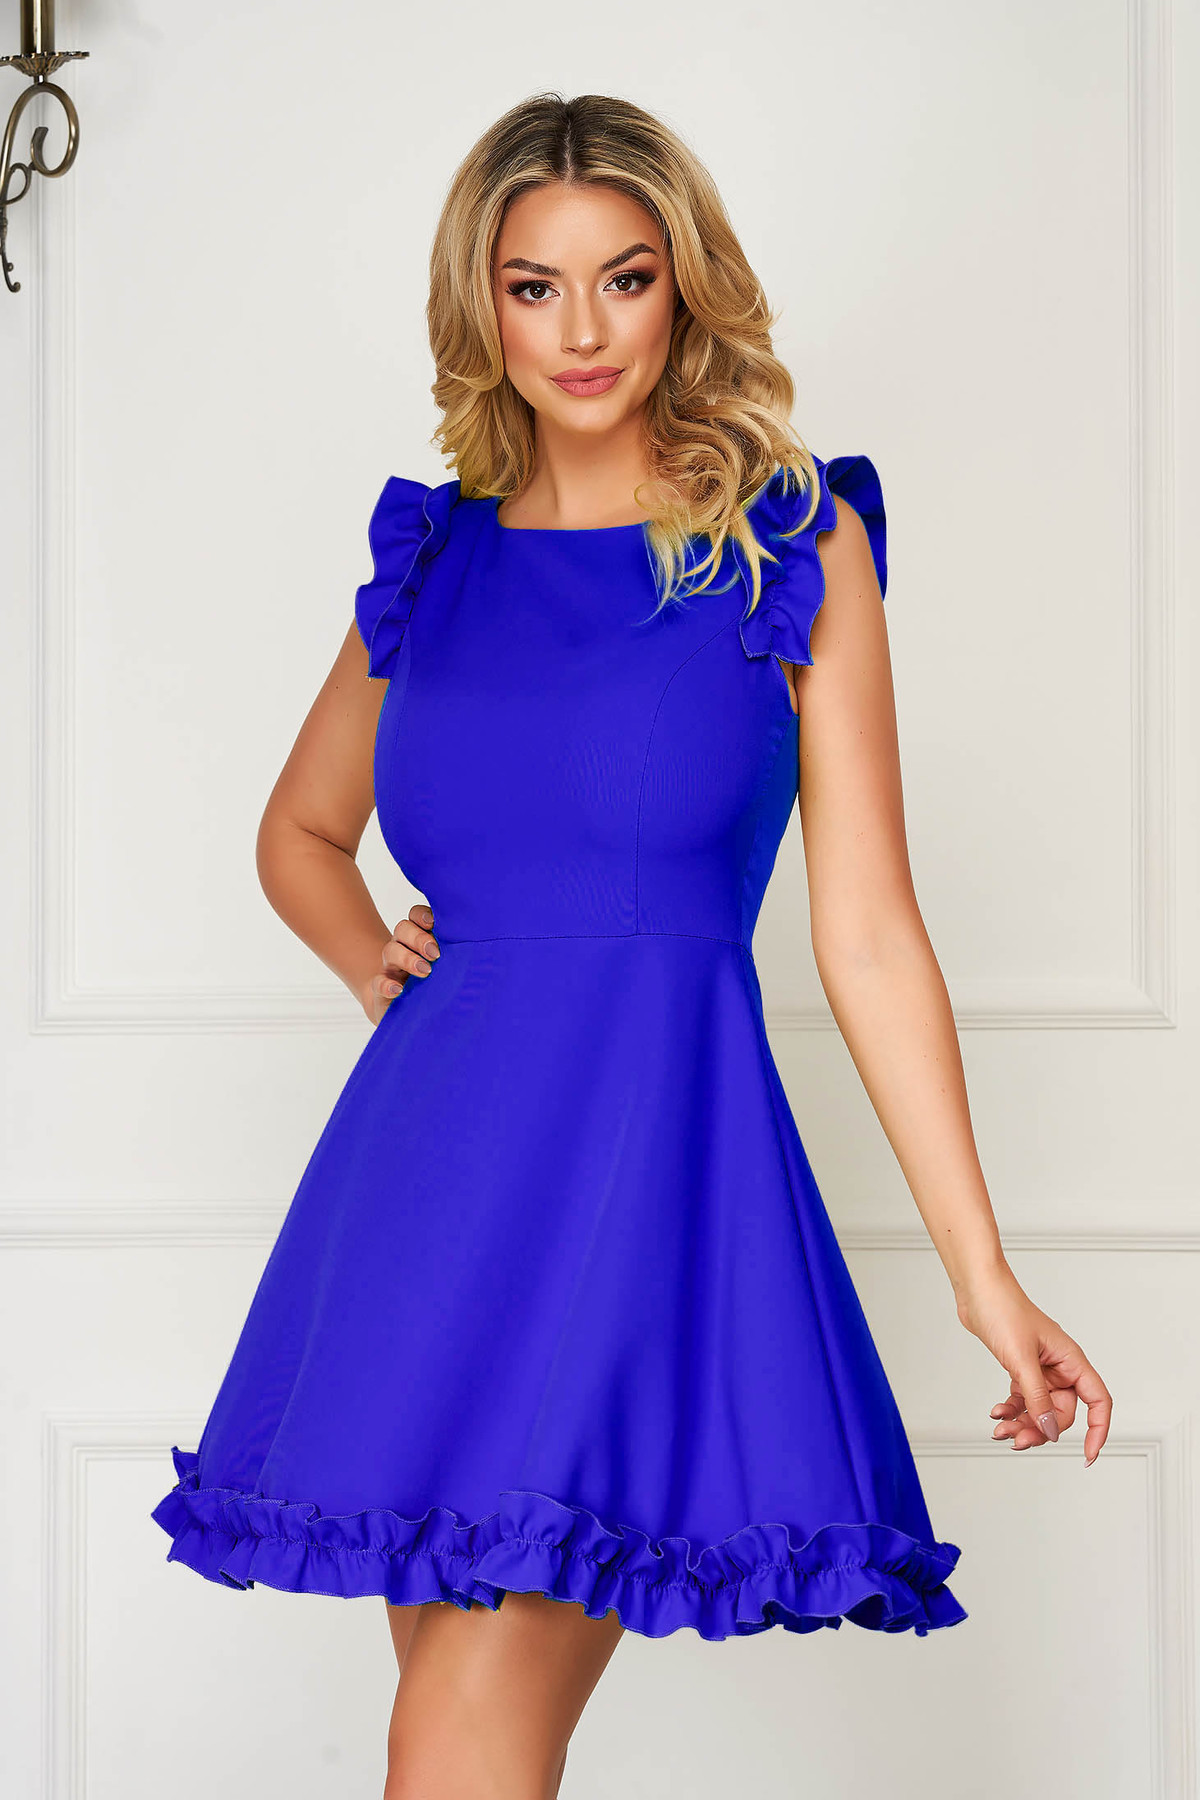 Rochie albastra eleganta scurta din stofa cu volanase la maneca - medelin.ro